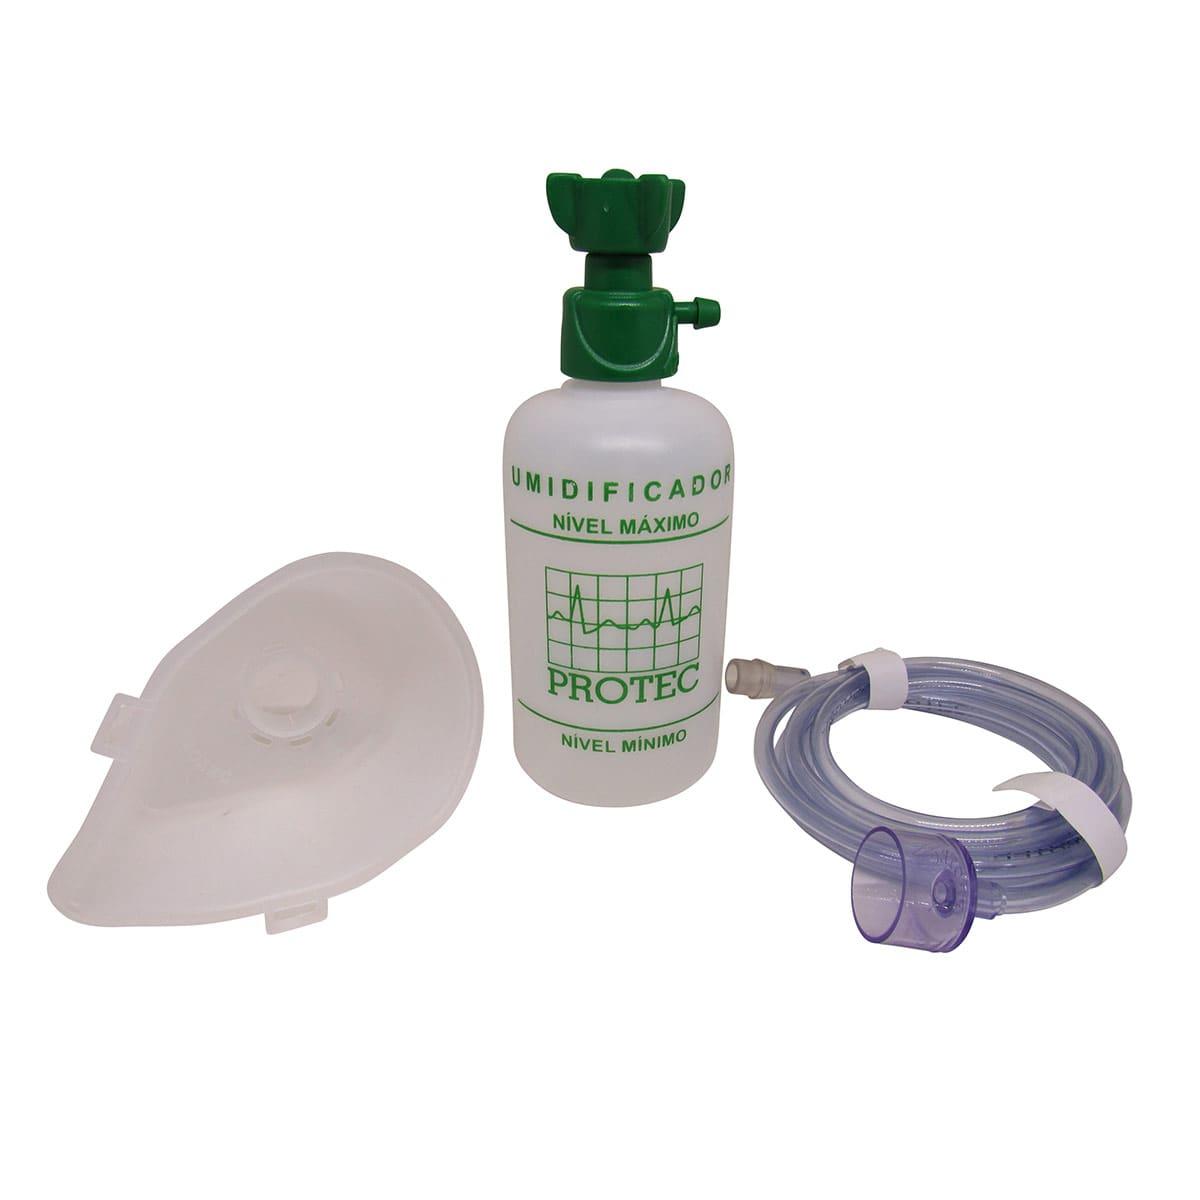 Umidificador de Oxigênio Extensão e Máscara Adulto Protec